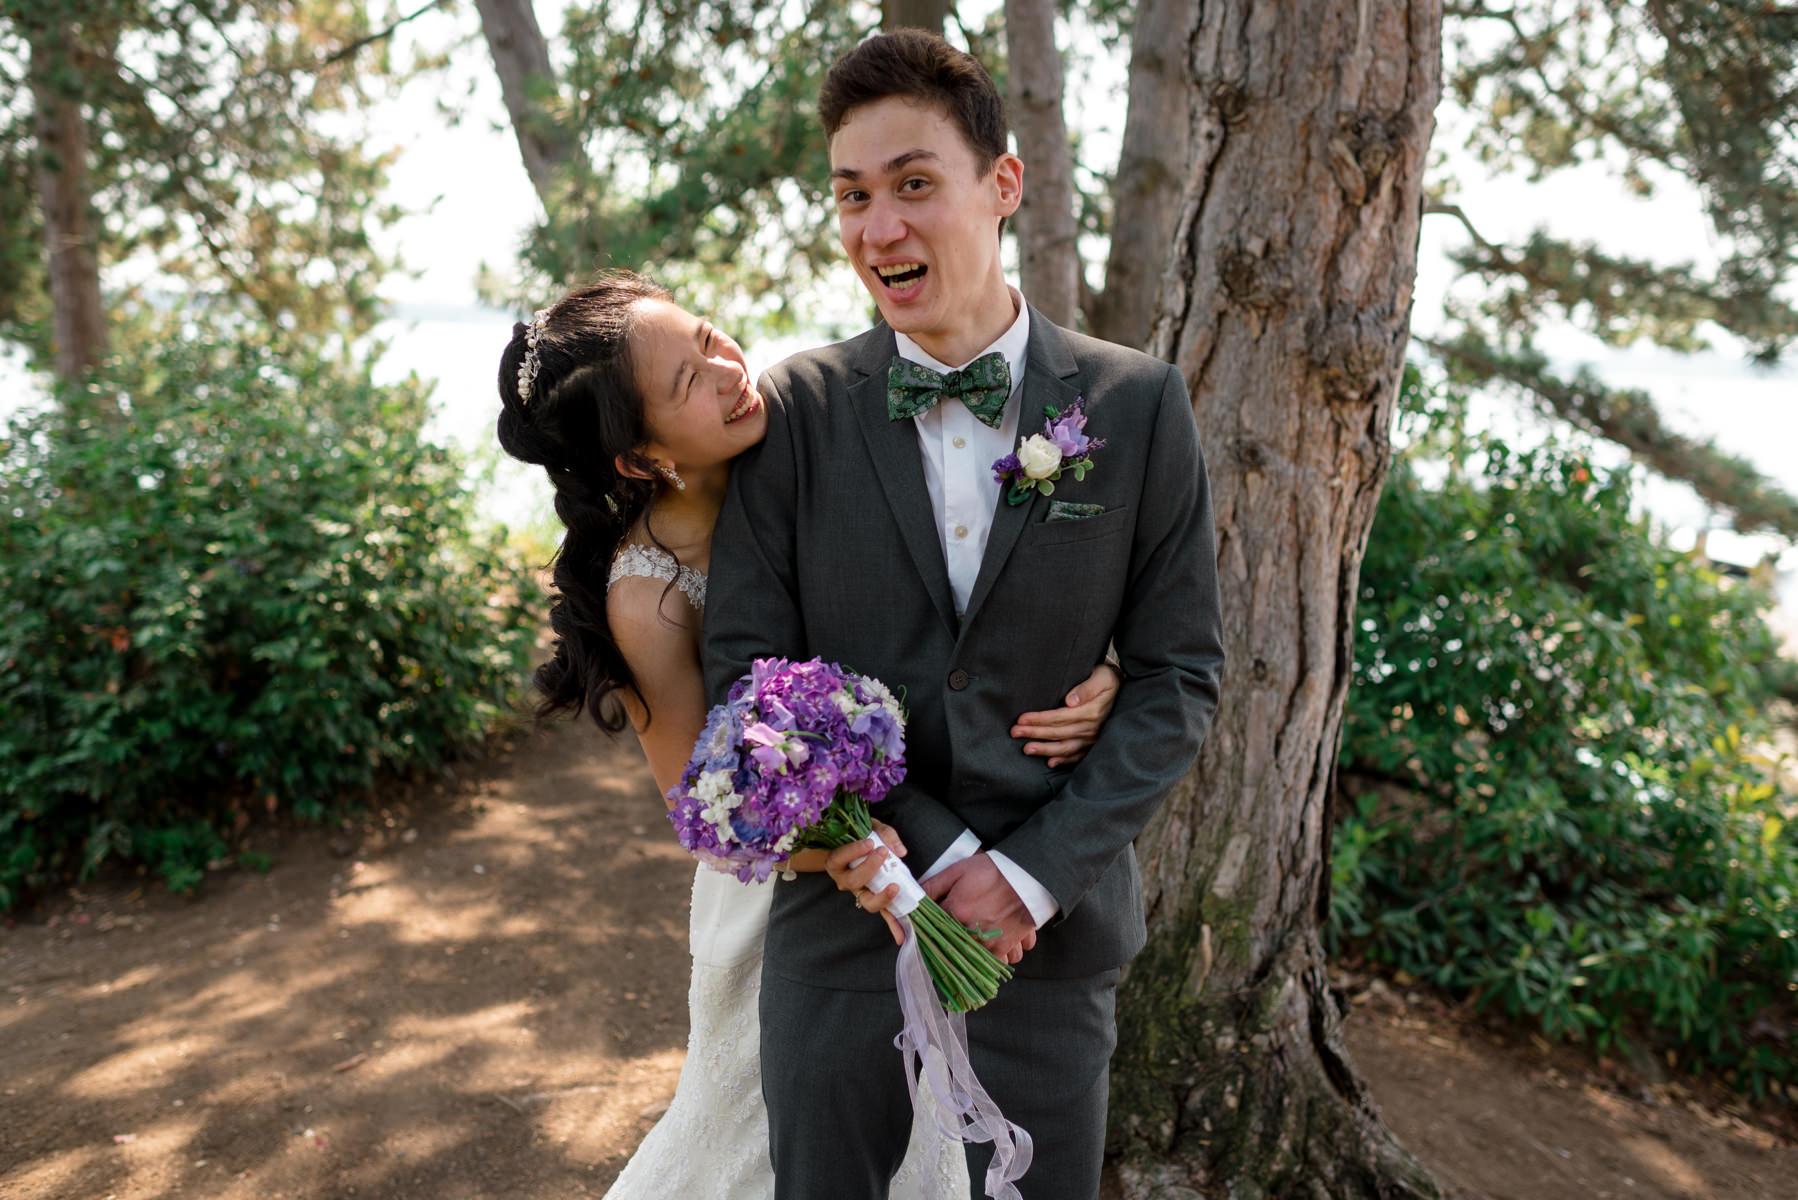 Andrew Tat - Documentary Wedding Photography - Heritage Hall - Kirkland, Washington - Grace & James - 27.JPG